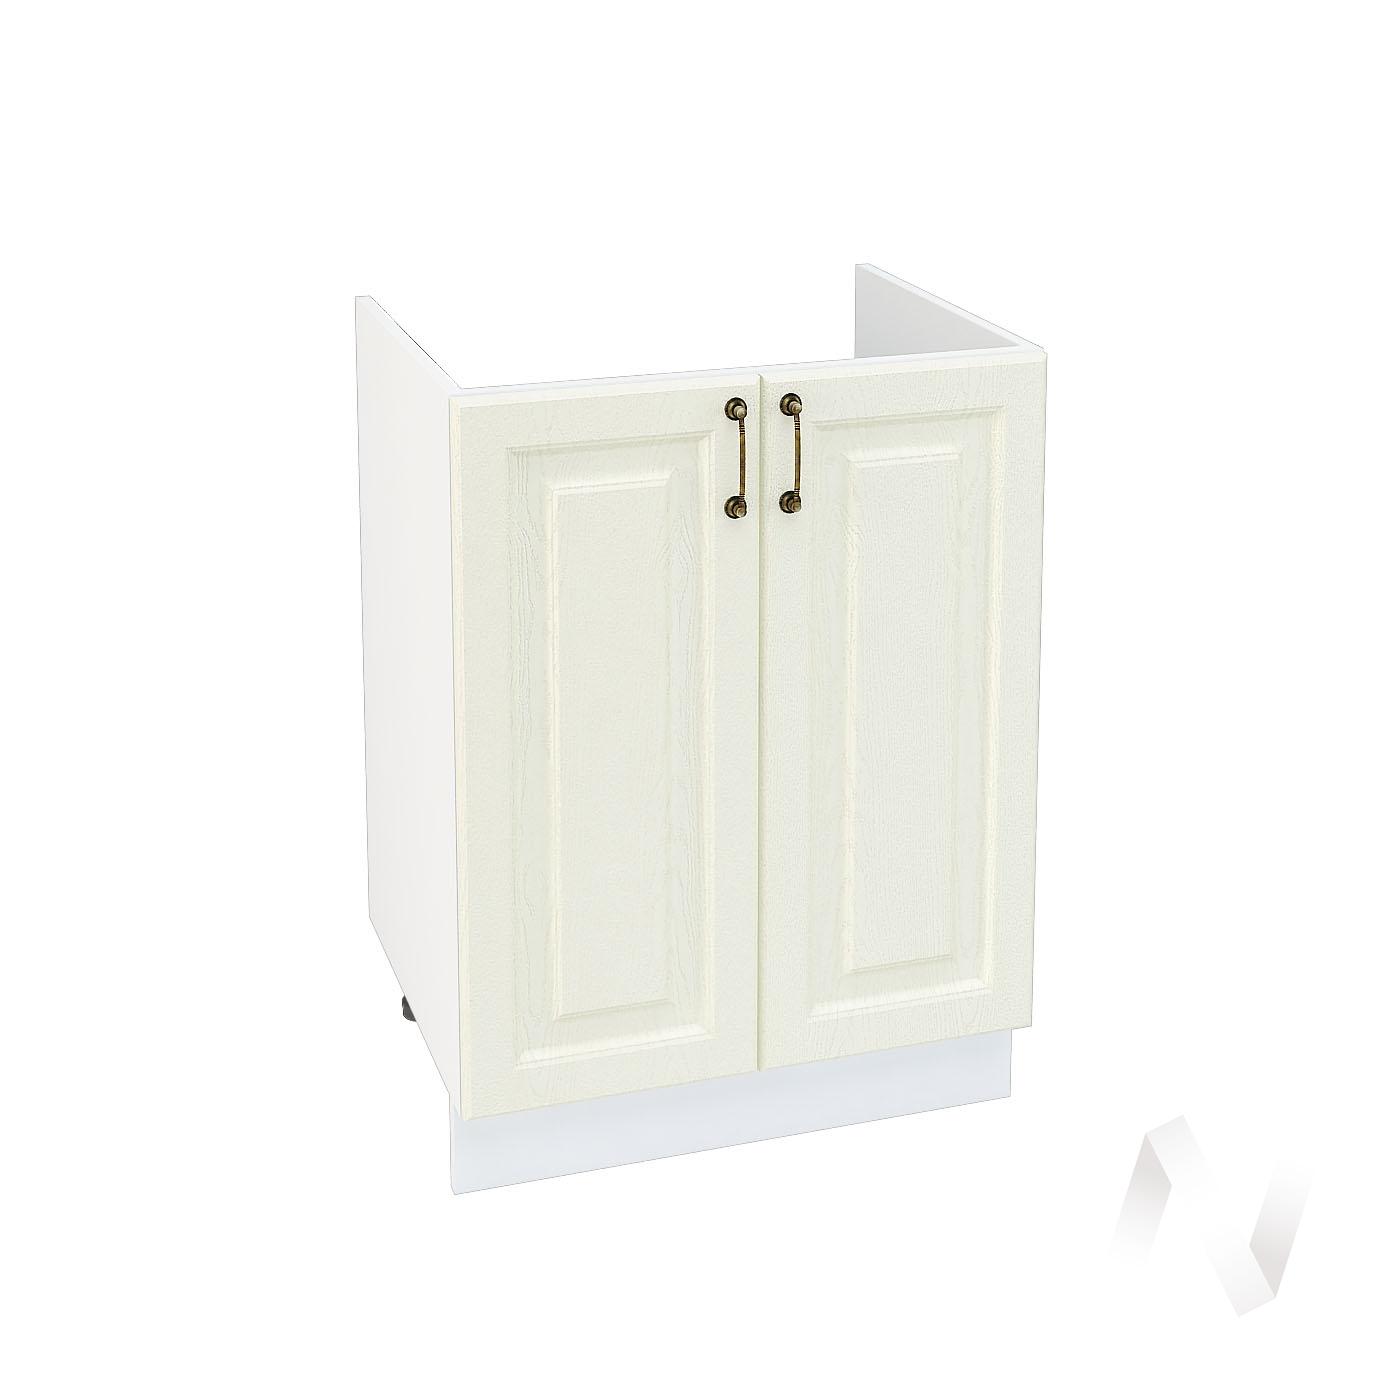 "Кухня ""Ницца"": Шкаф нижний под мойку 600, ШНМ 600 (Крем/корпус белый)"